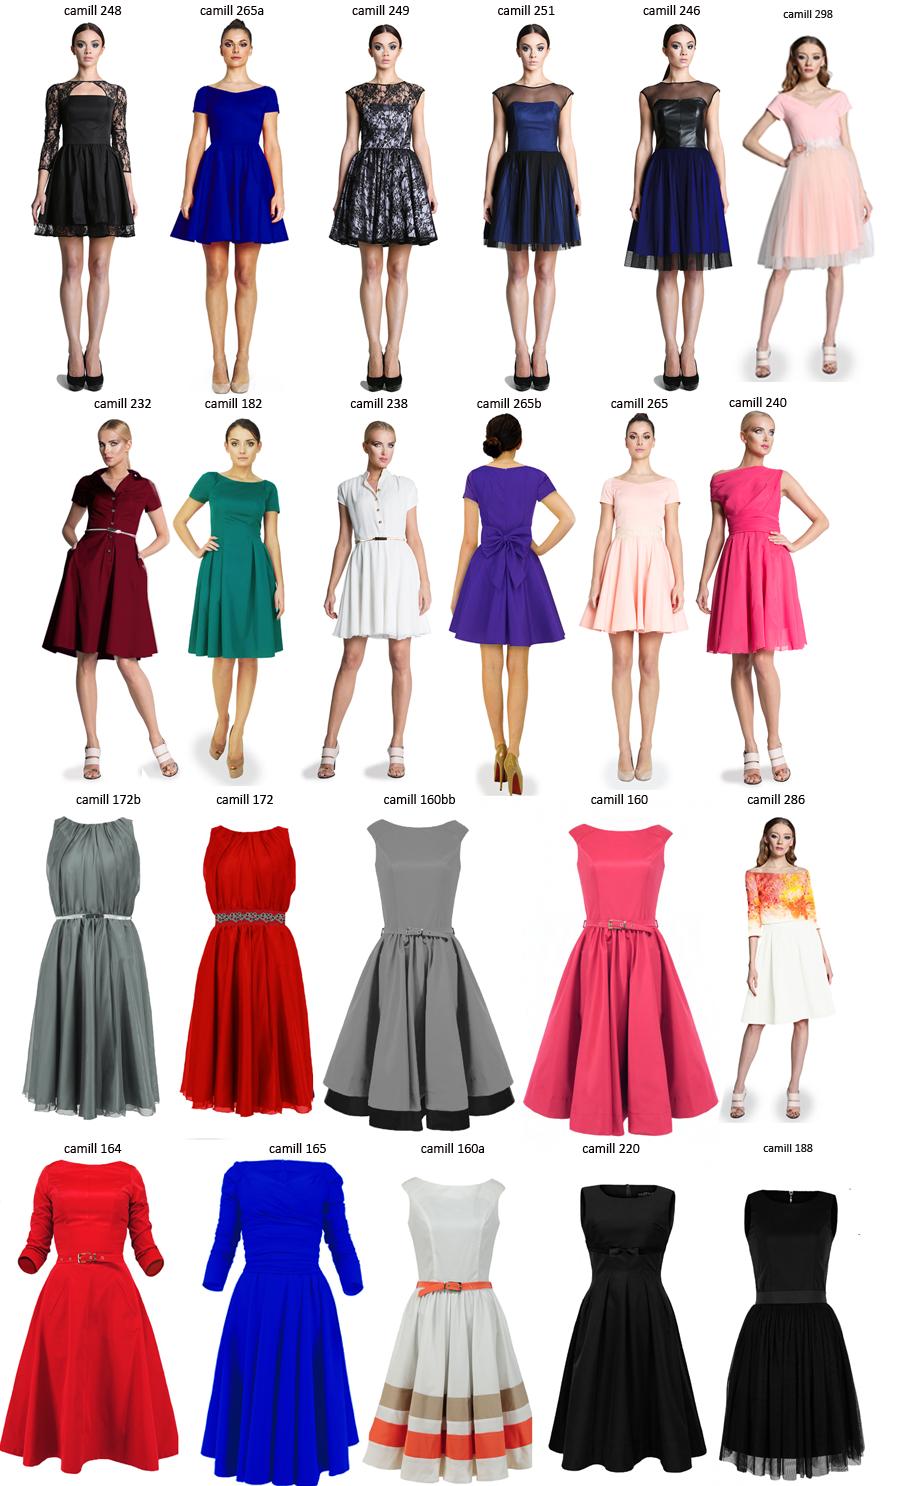 Camill 016 Bordowa sukienka z koła dekolt V r.42